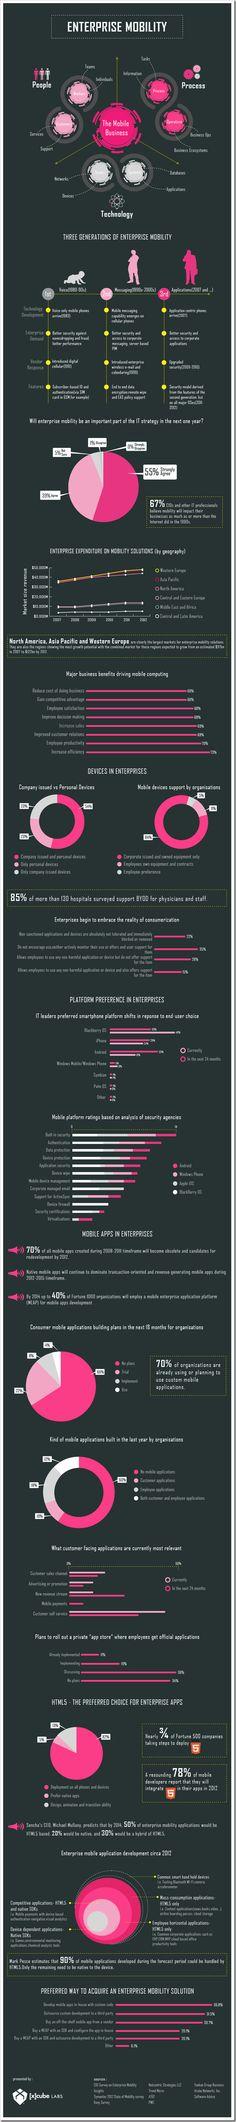 Enterprise Mobility. #BYOD #EnterpriseMobility #Infographic #Security